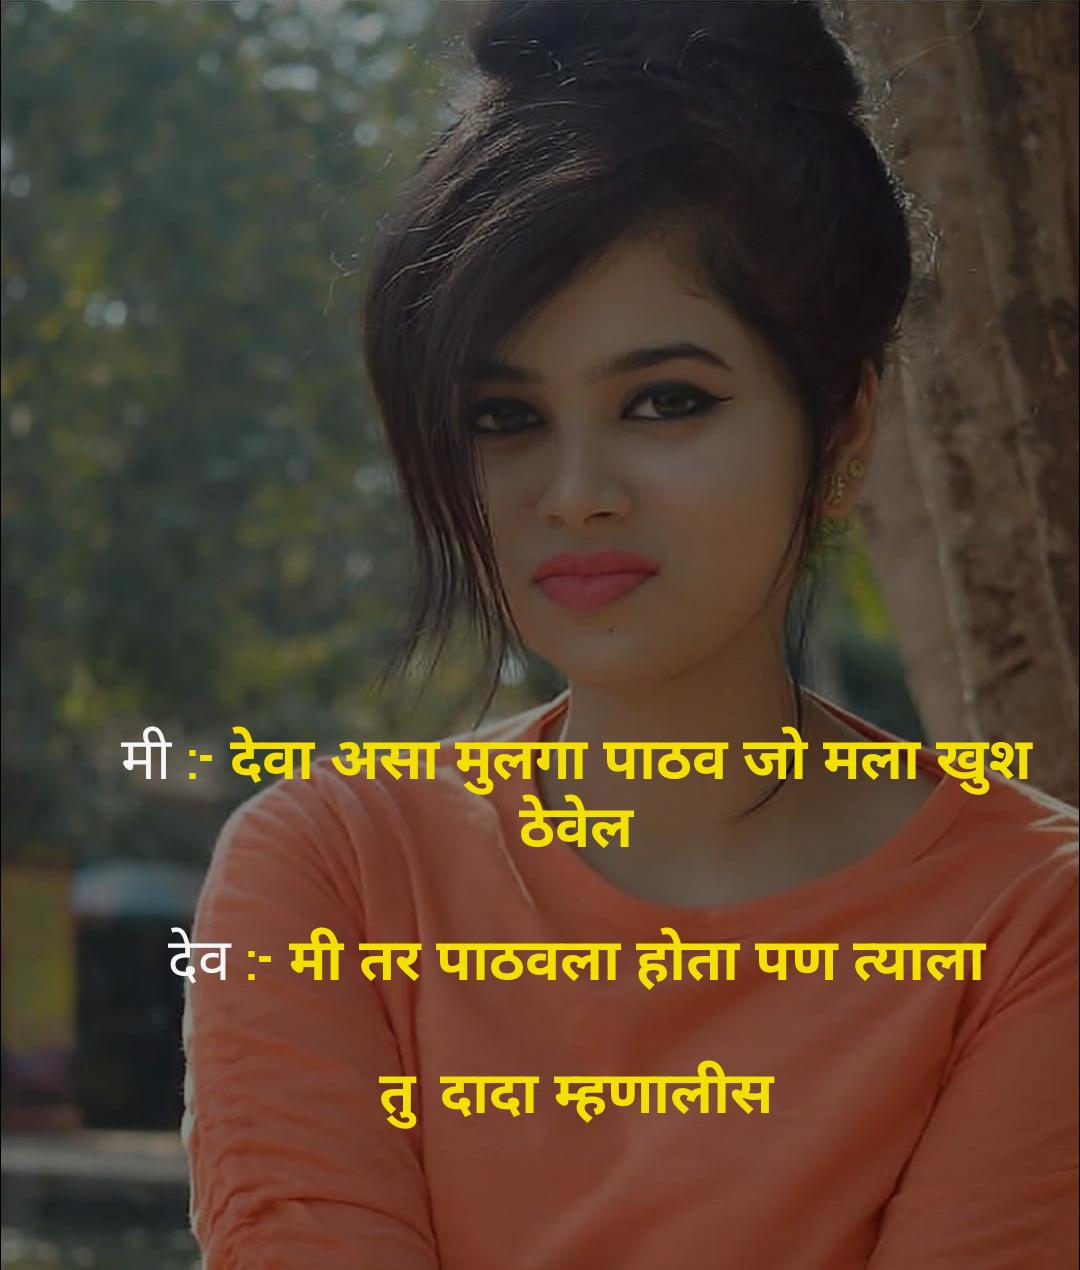 Attitude status in marathi for girl